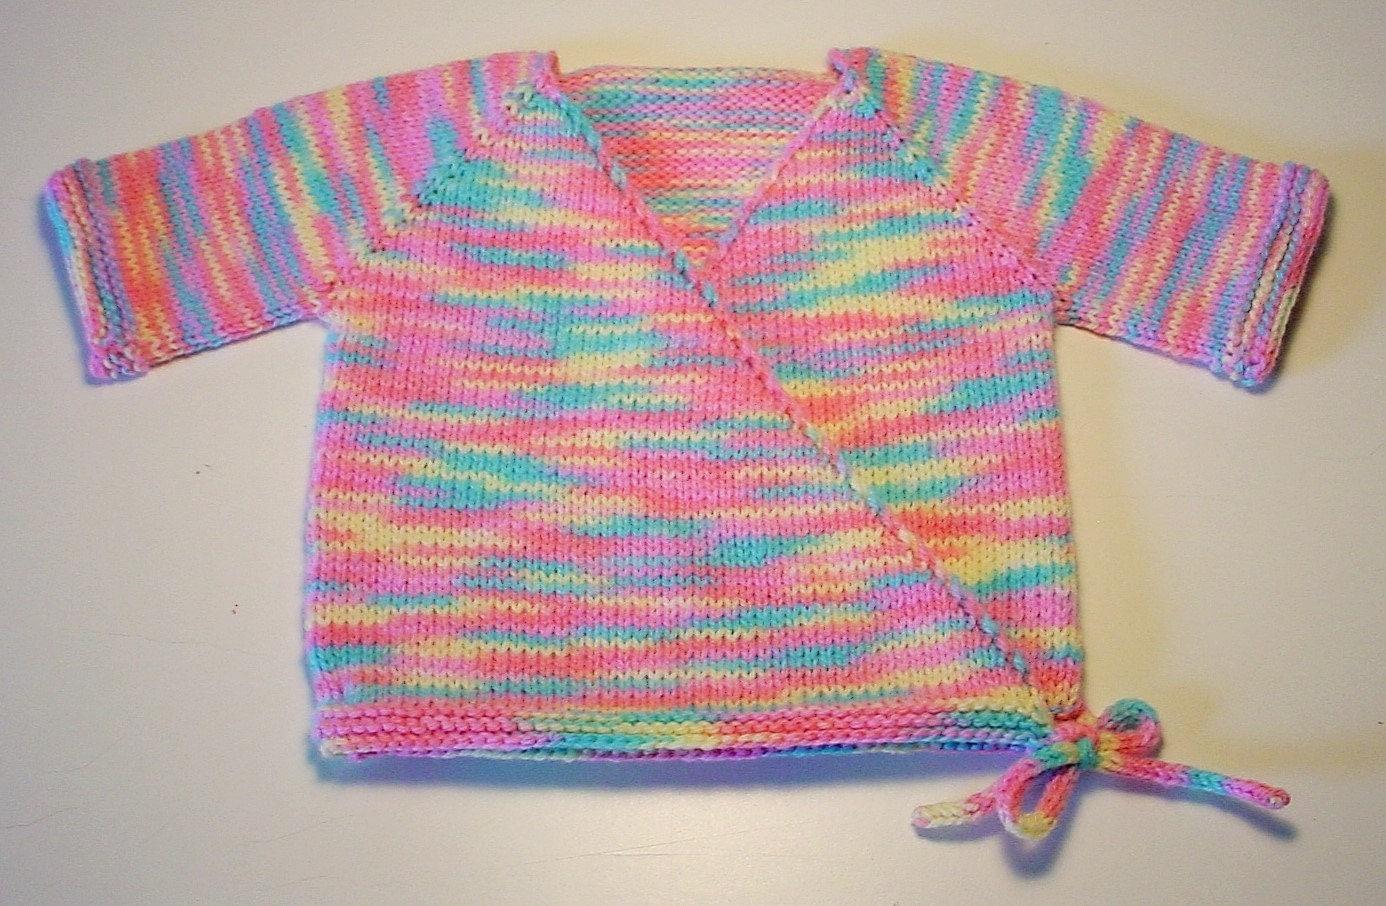 Knitting Pattern For Kimono Wrap : Hand Knit Pastel Baby Kimono Sweater Shower Gift Wrap